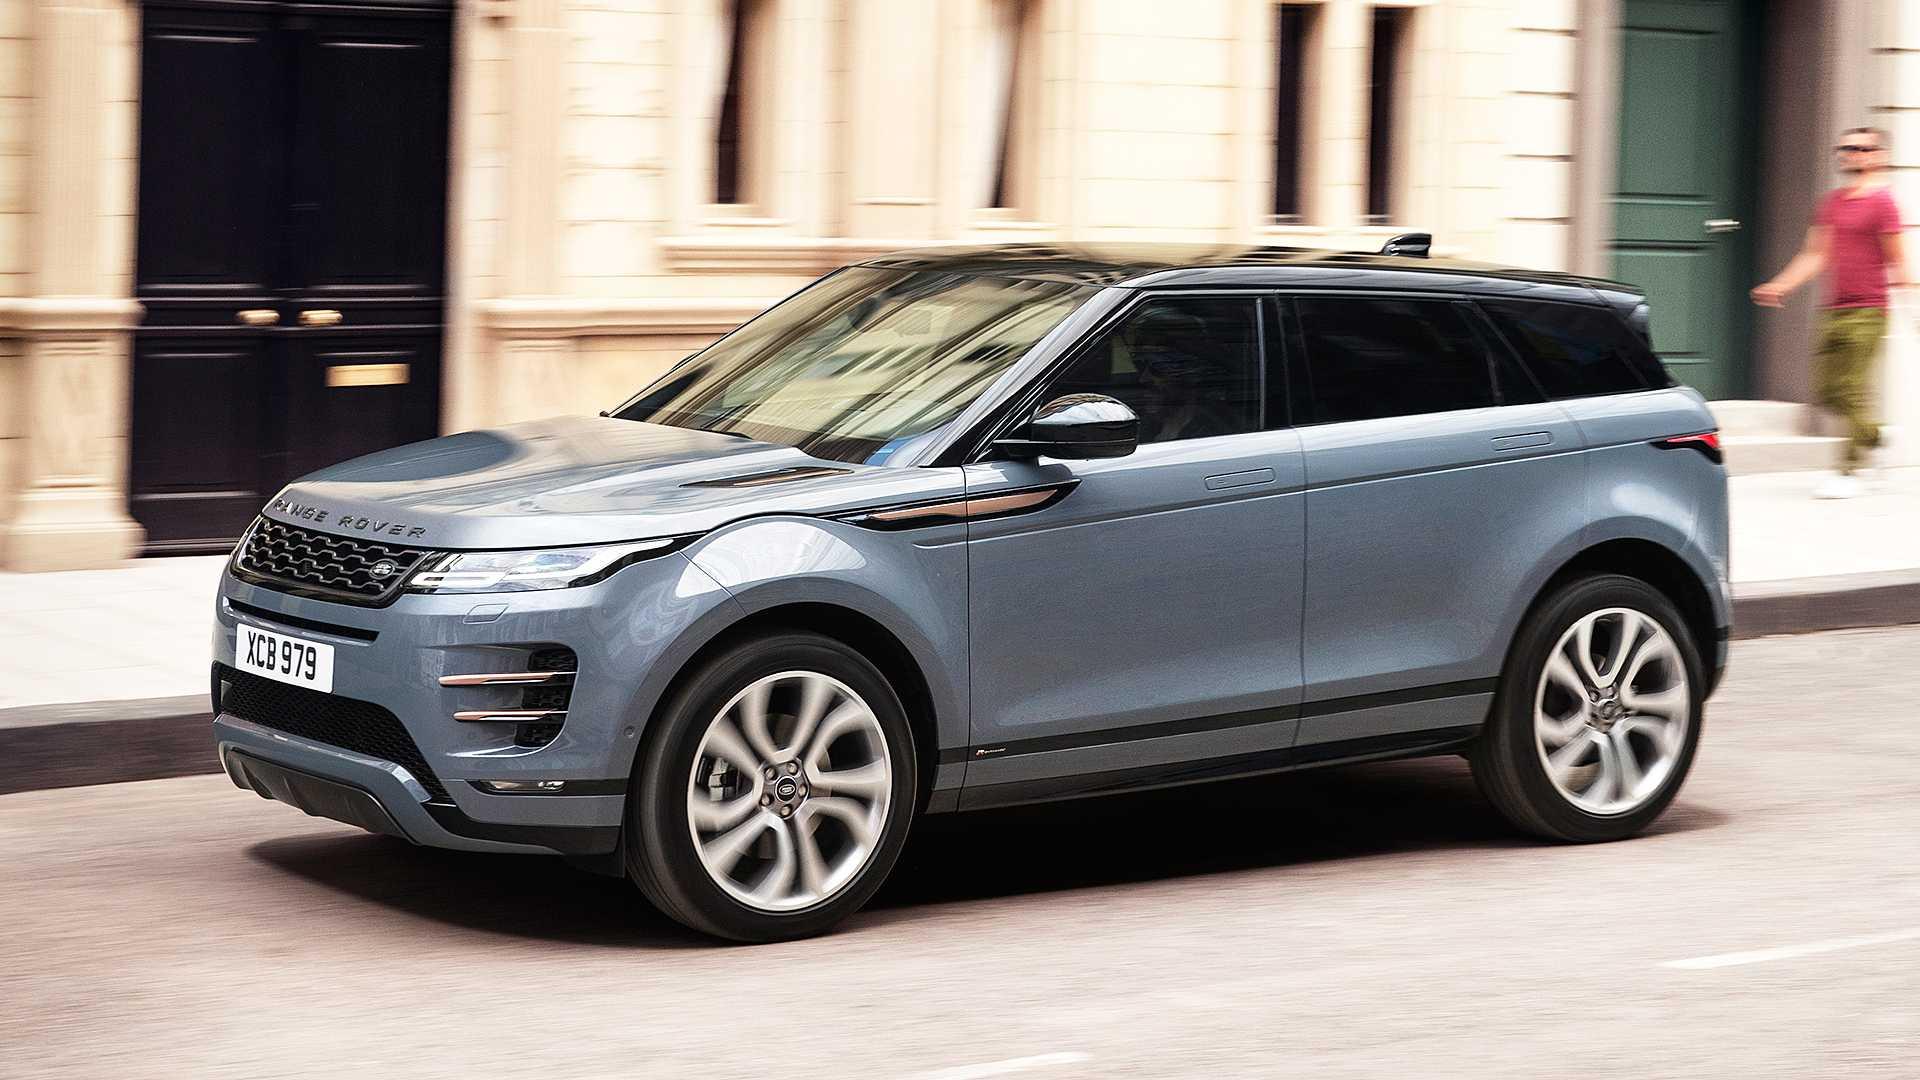 2020-range-rover-evoque (21)